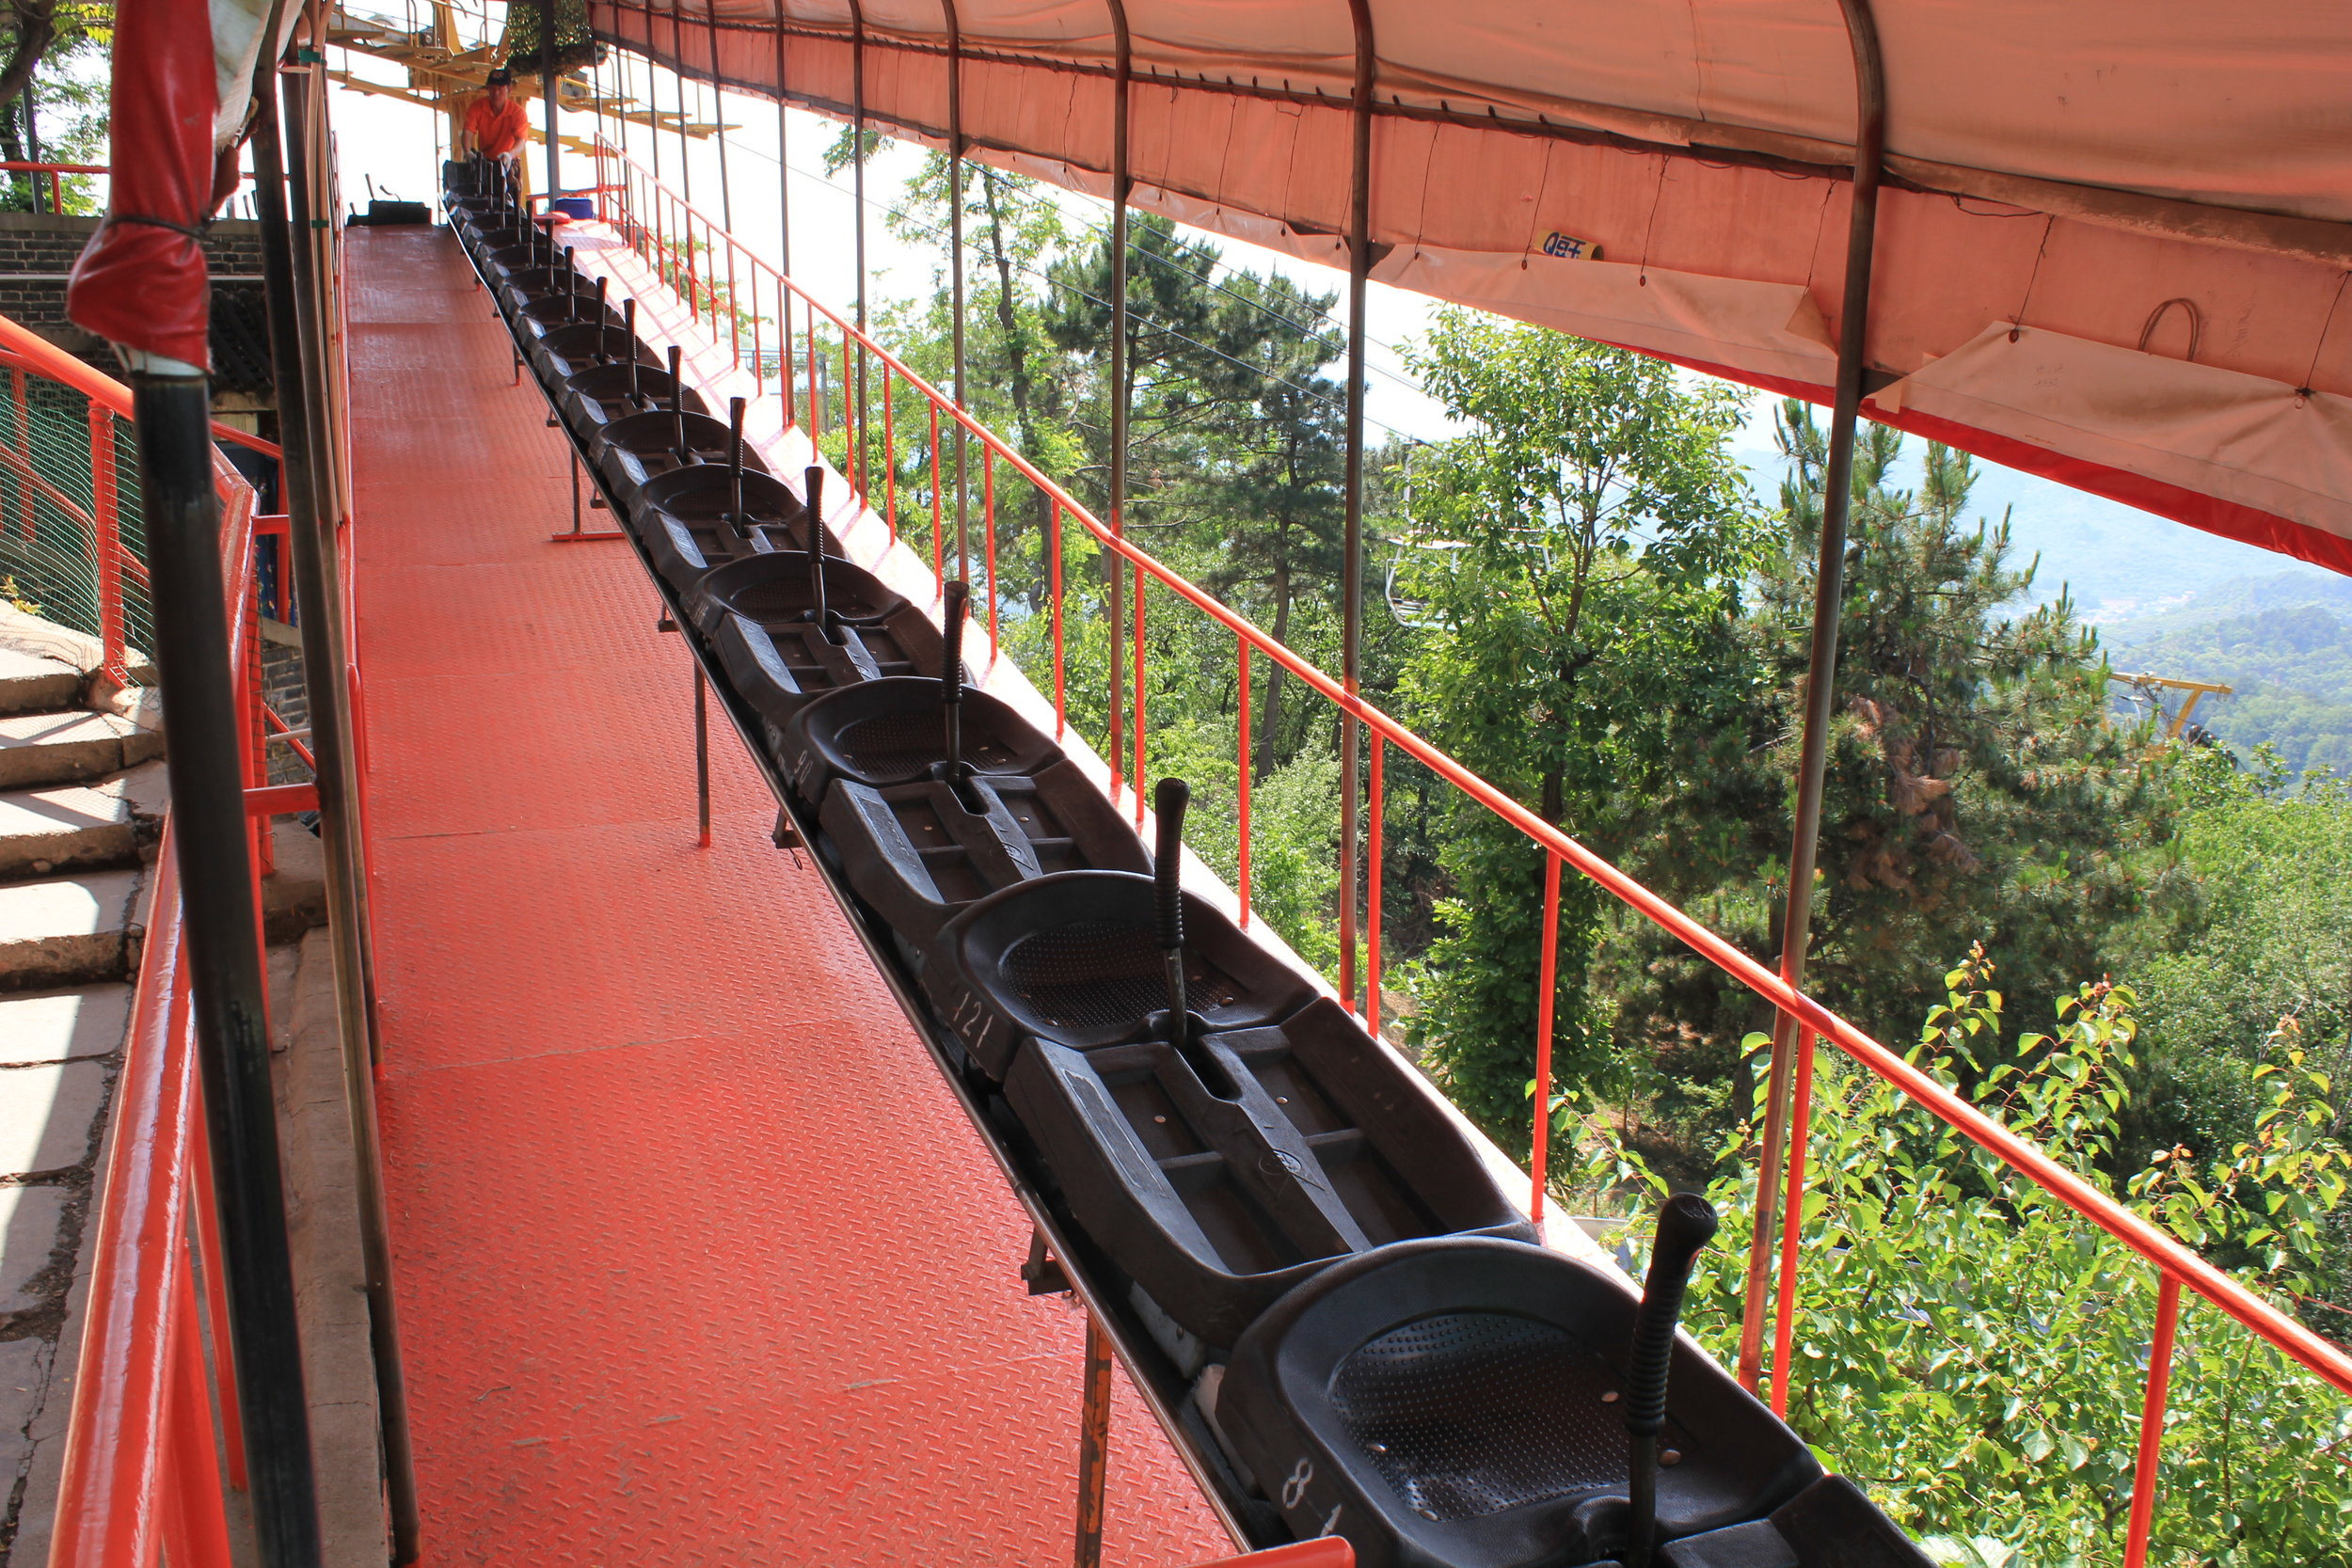 Mutianyu Great Wall – Toboggans